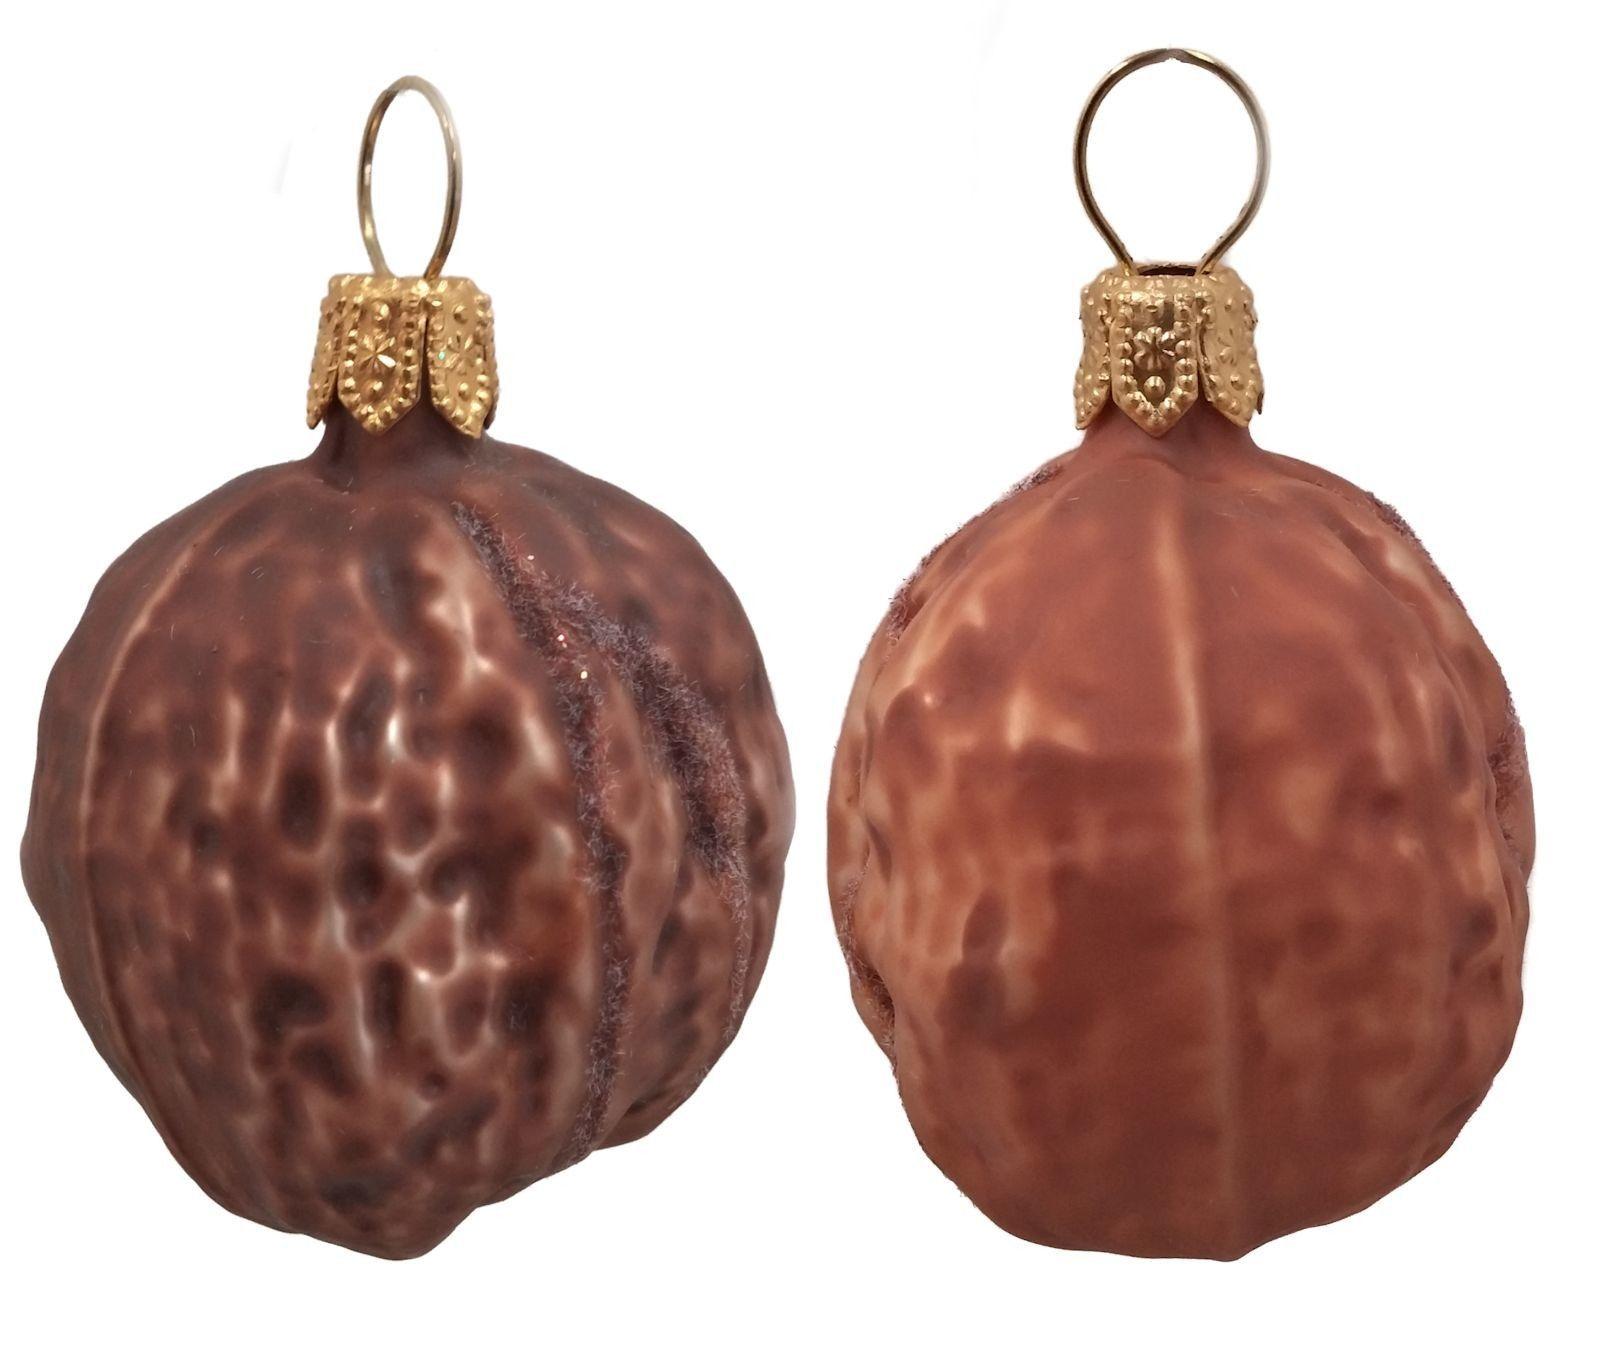 Shelled Walnuts Polish Mouth Blown Glass Christmas Ornament ...